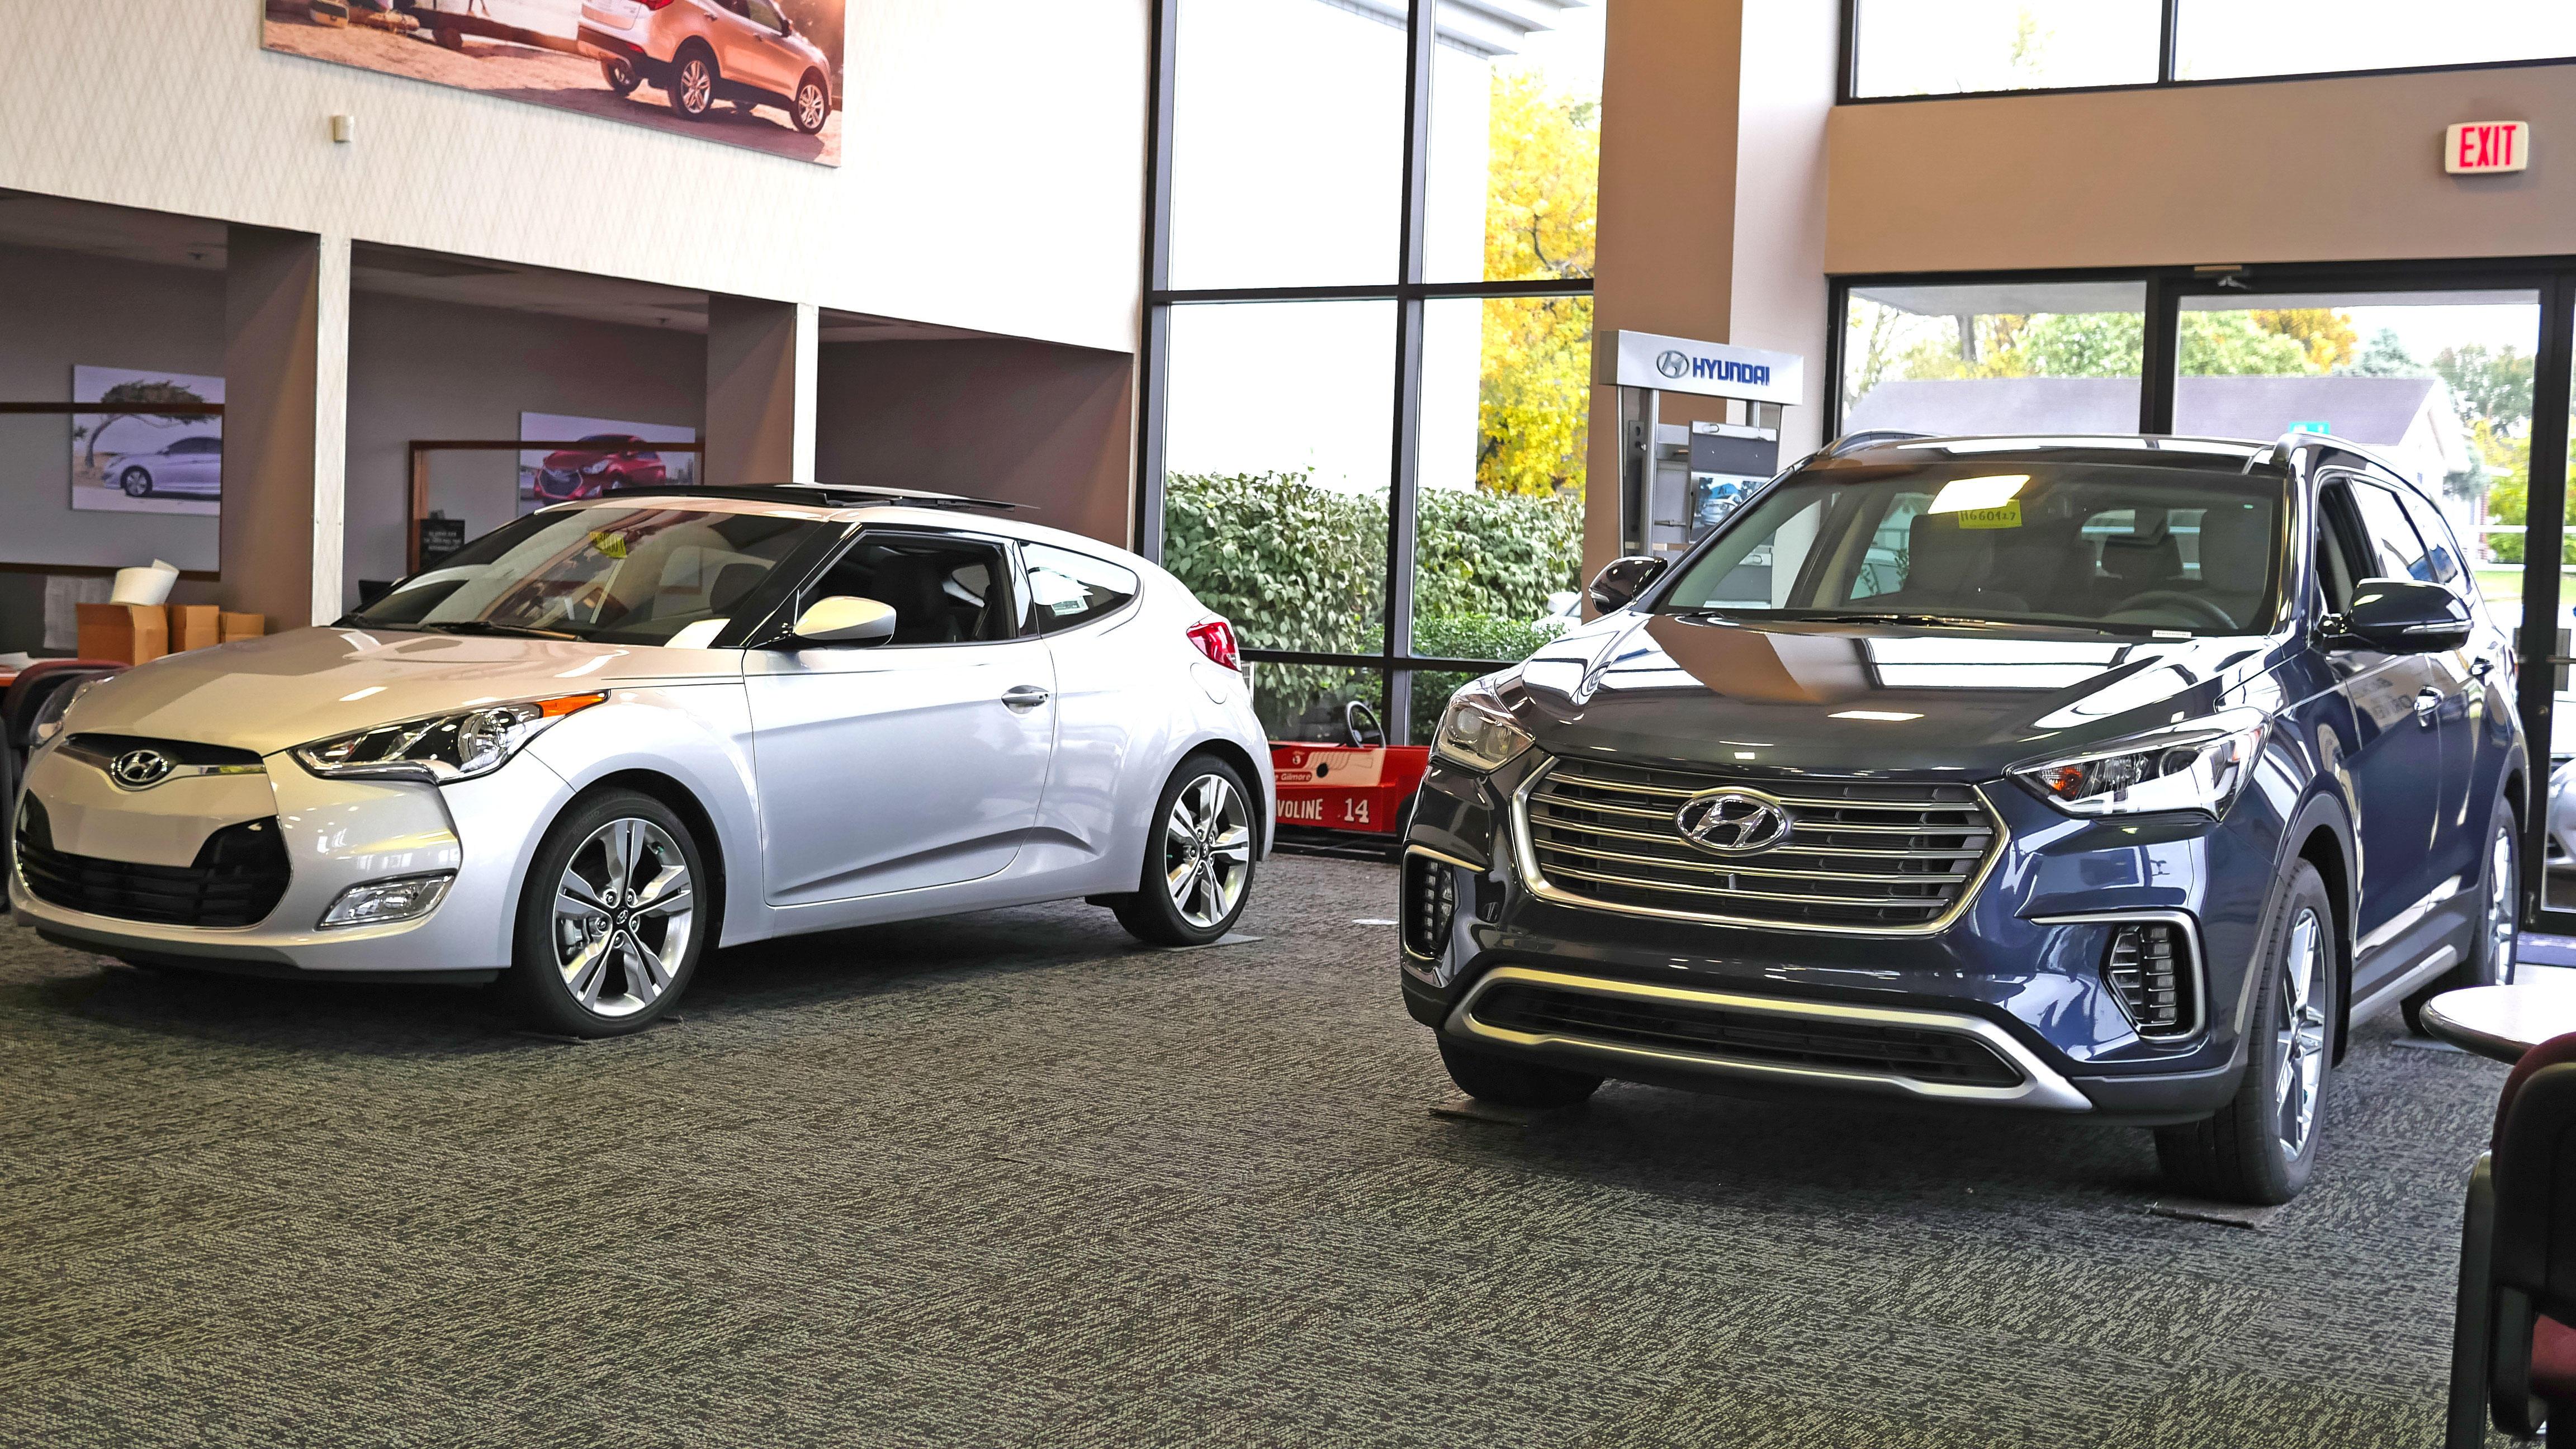 Bachman Hyundai image 3